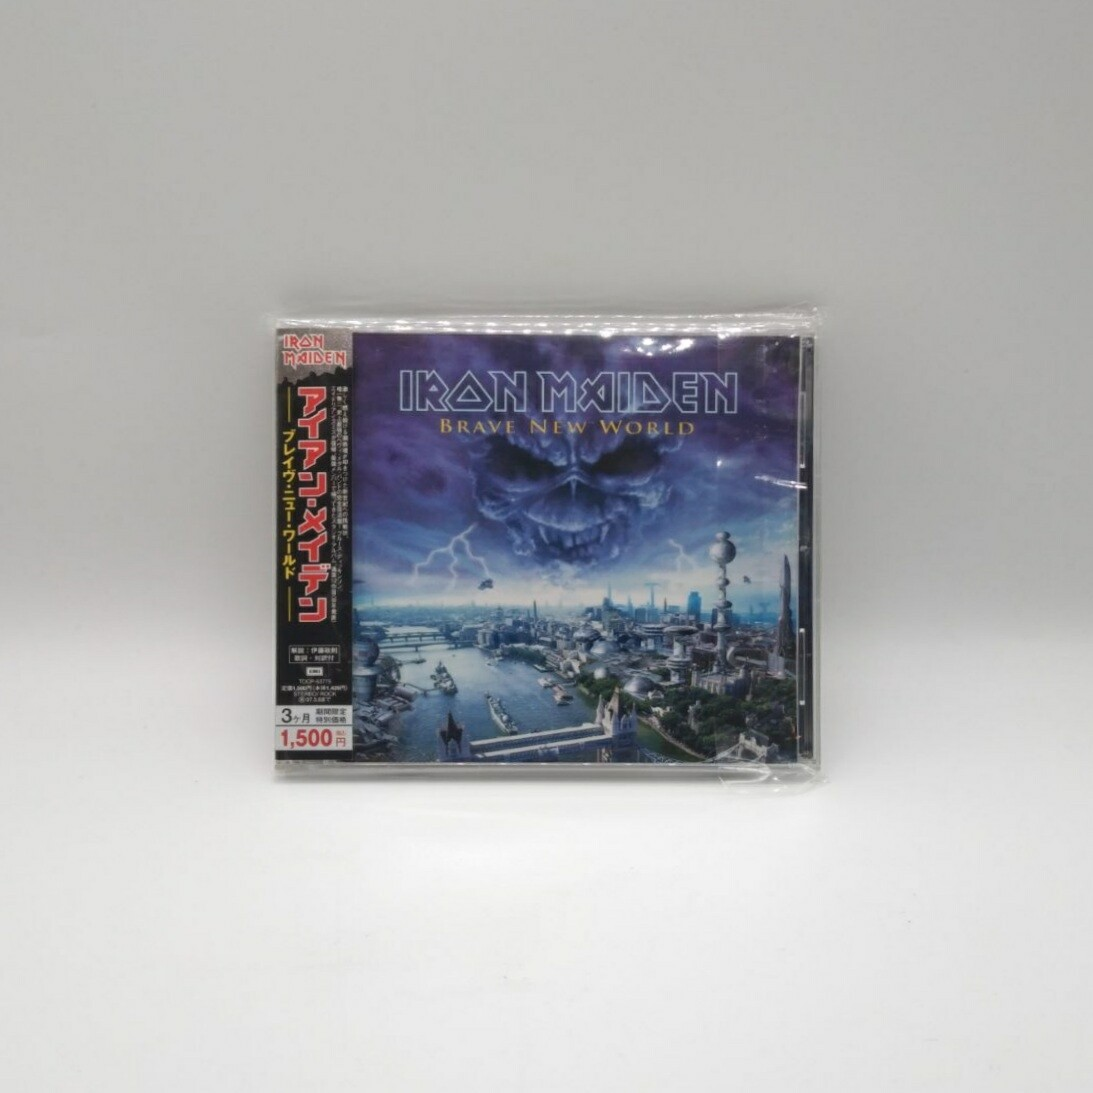 [USED] IRON MAIDEN -BRAVE NEW WORLD- CD (JAPAN PRESS)